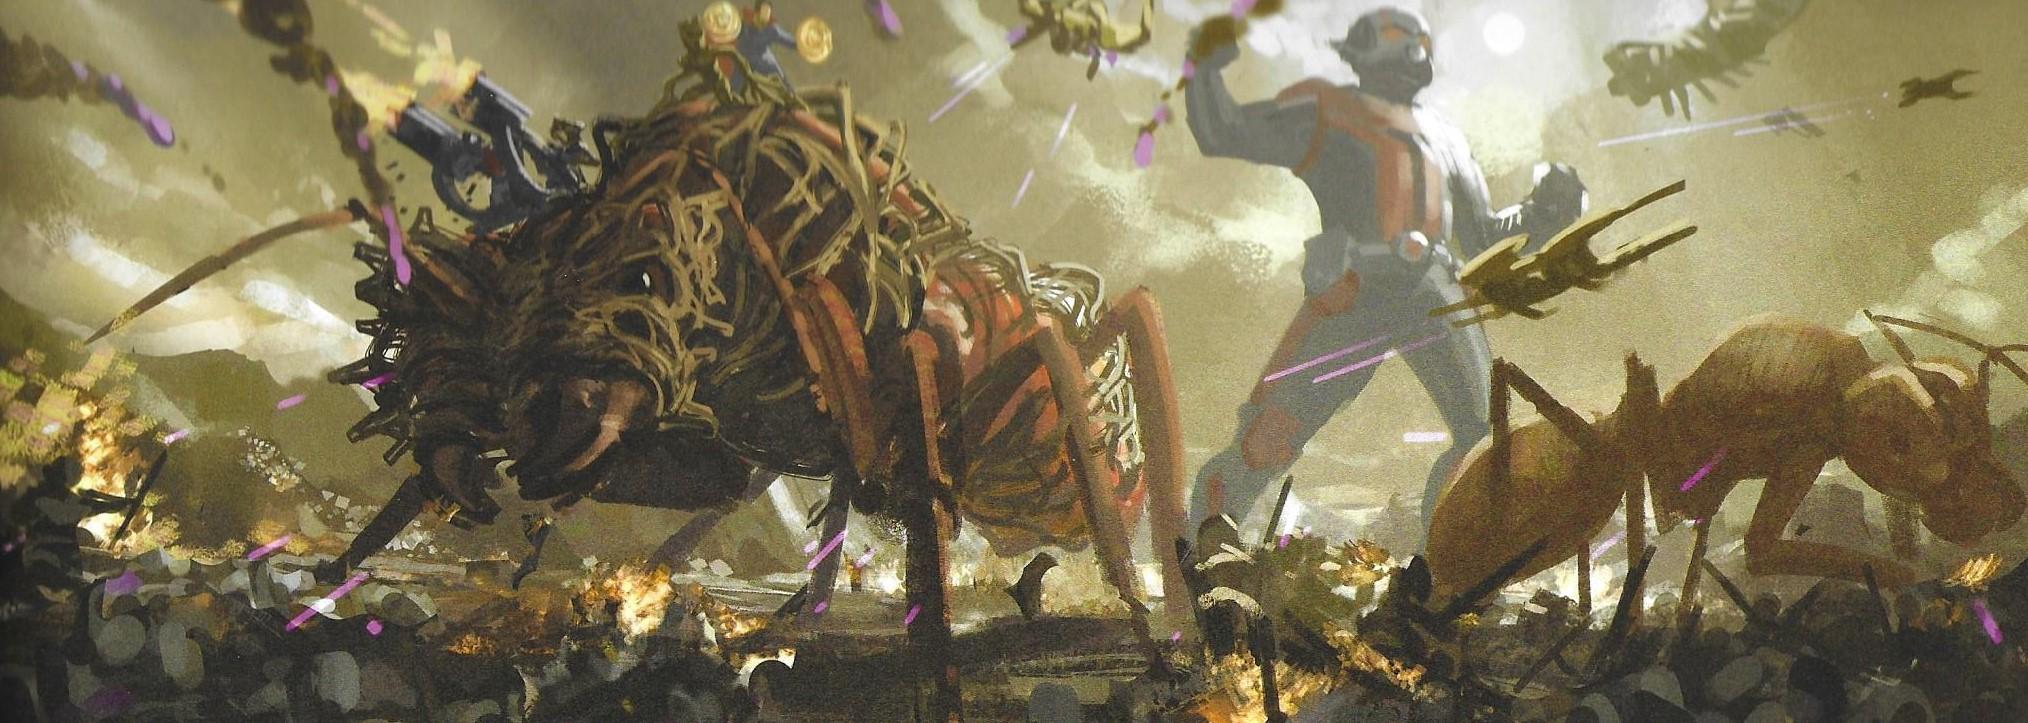 Wie Lange Läuft Avengers Endgame Im Kino